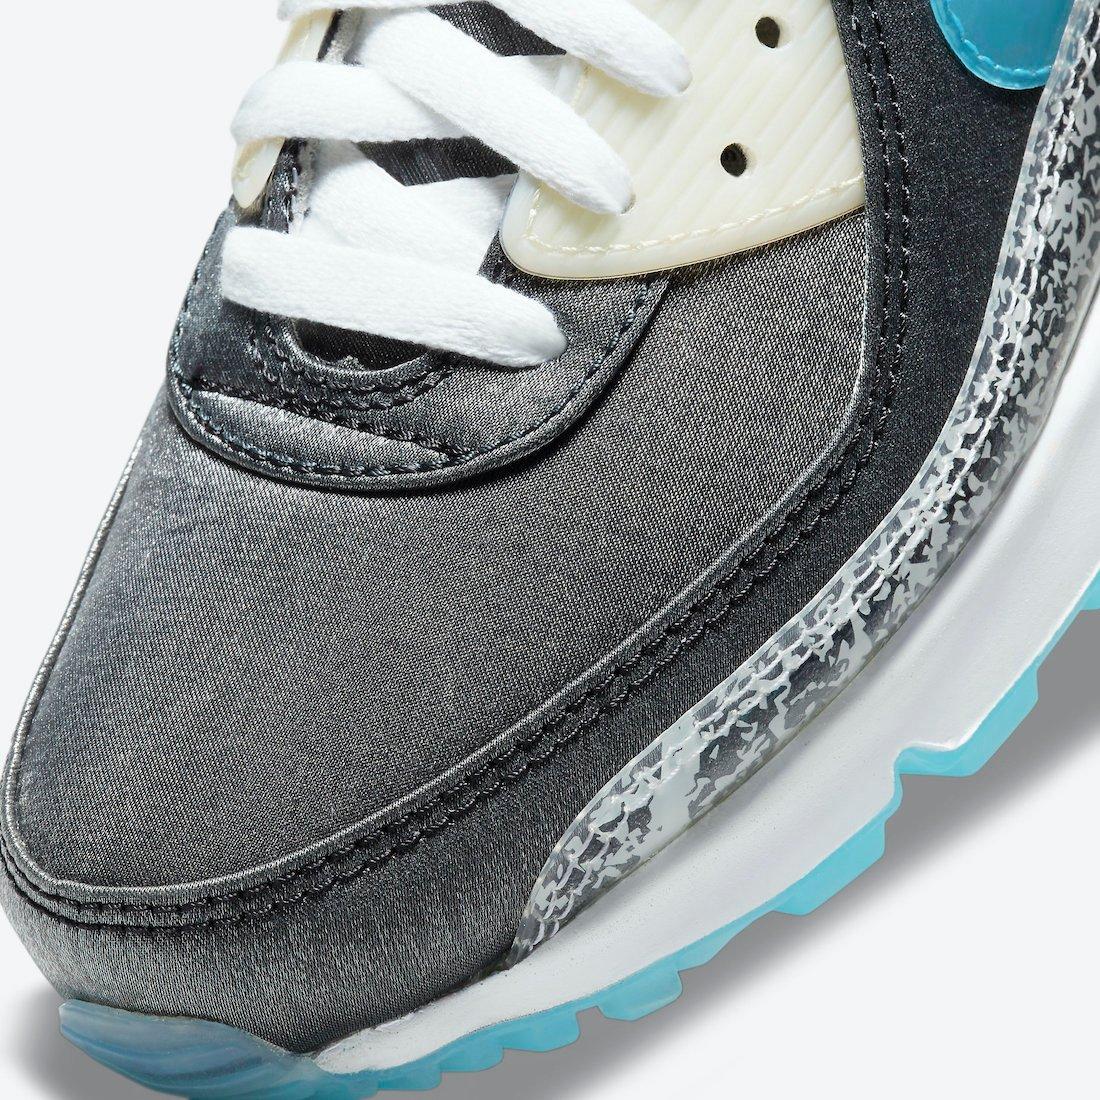 Nike Air Max 90 Rice Ball DD5483-010 Release Date Info